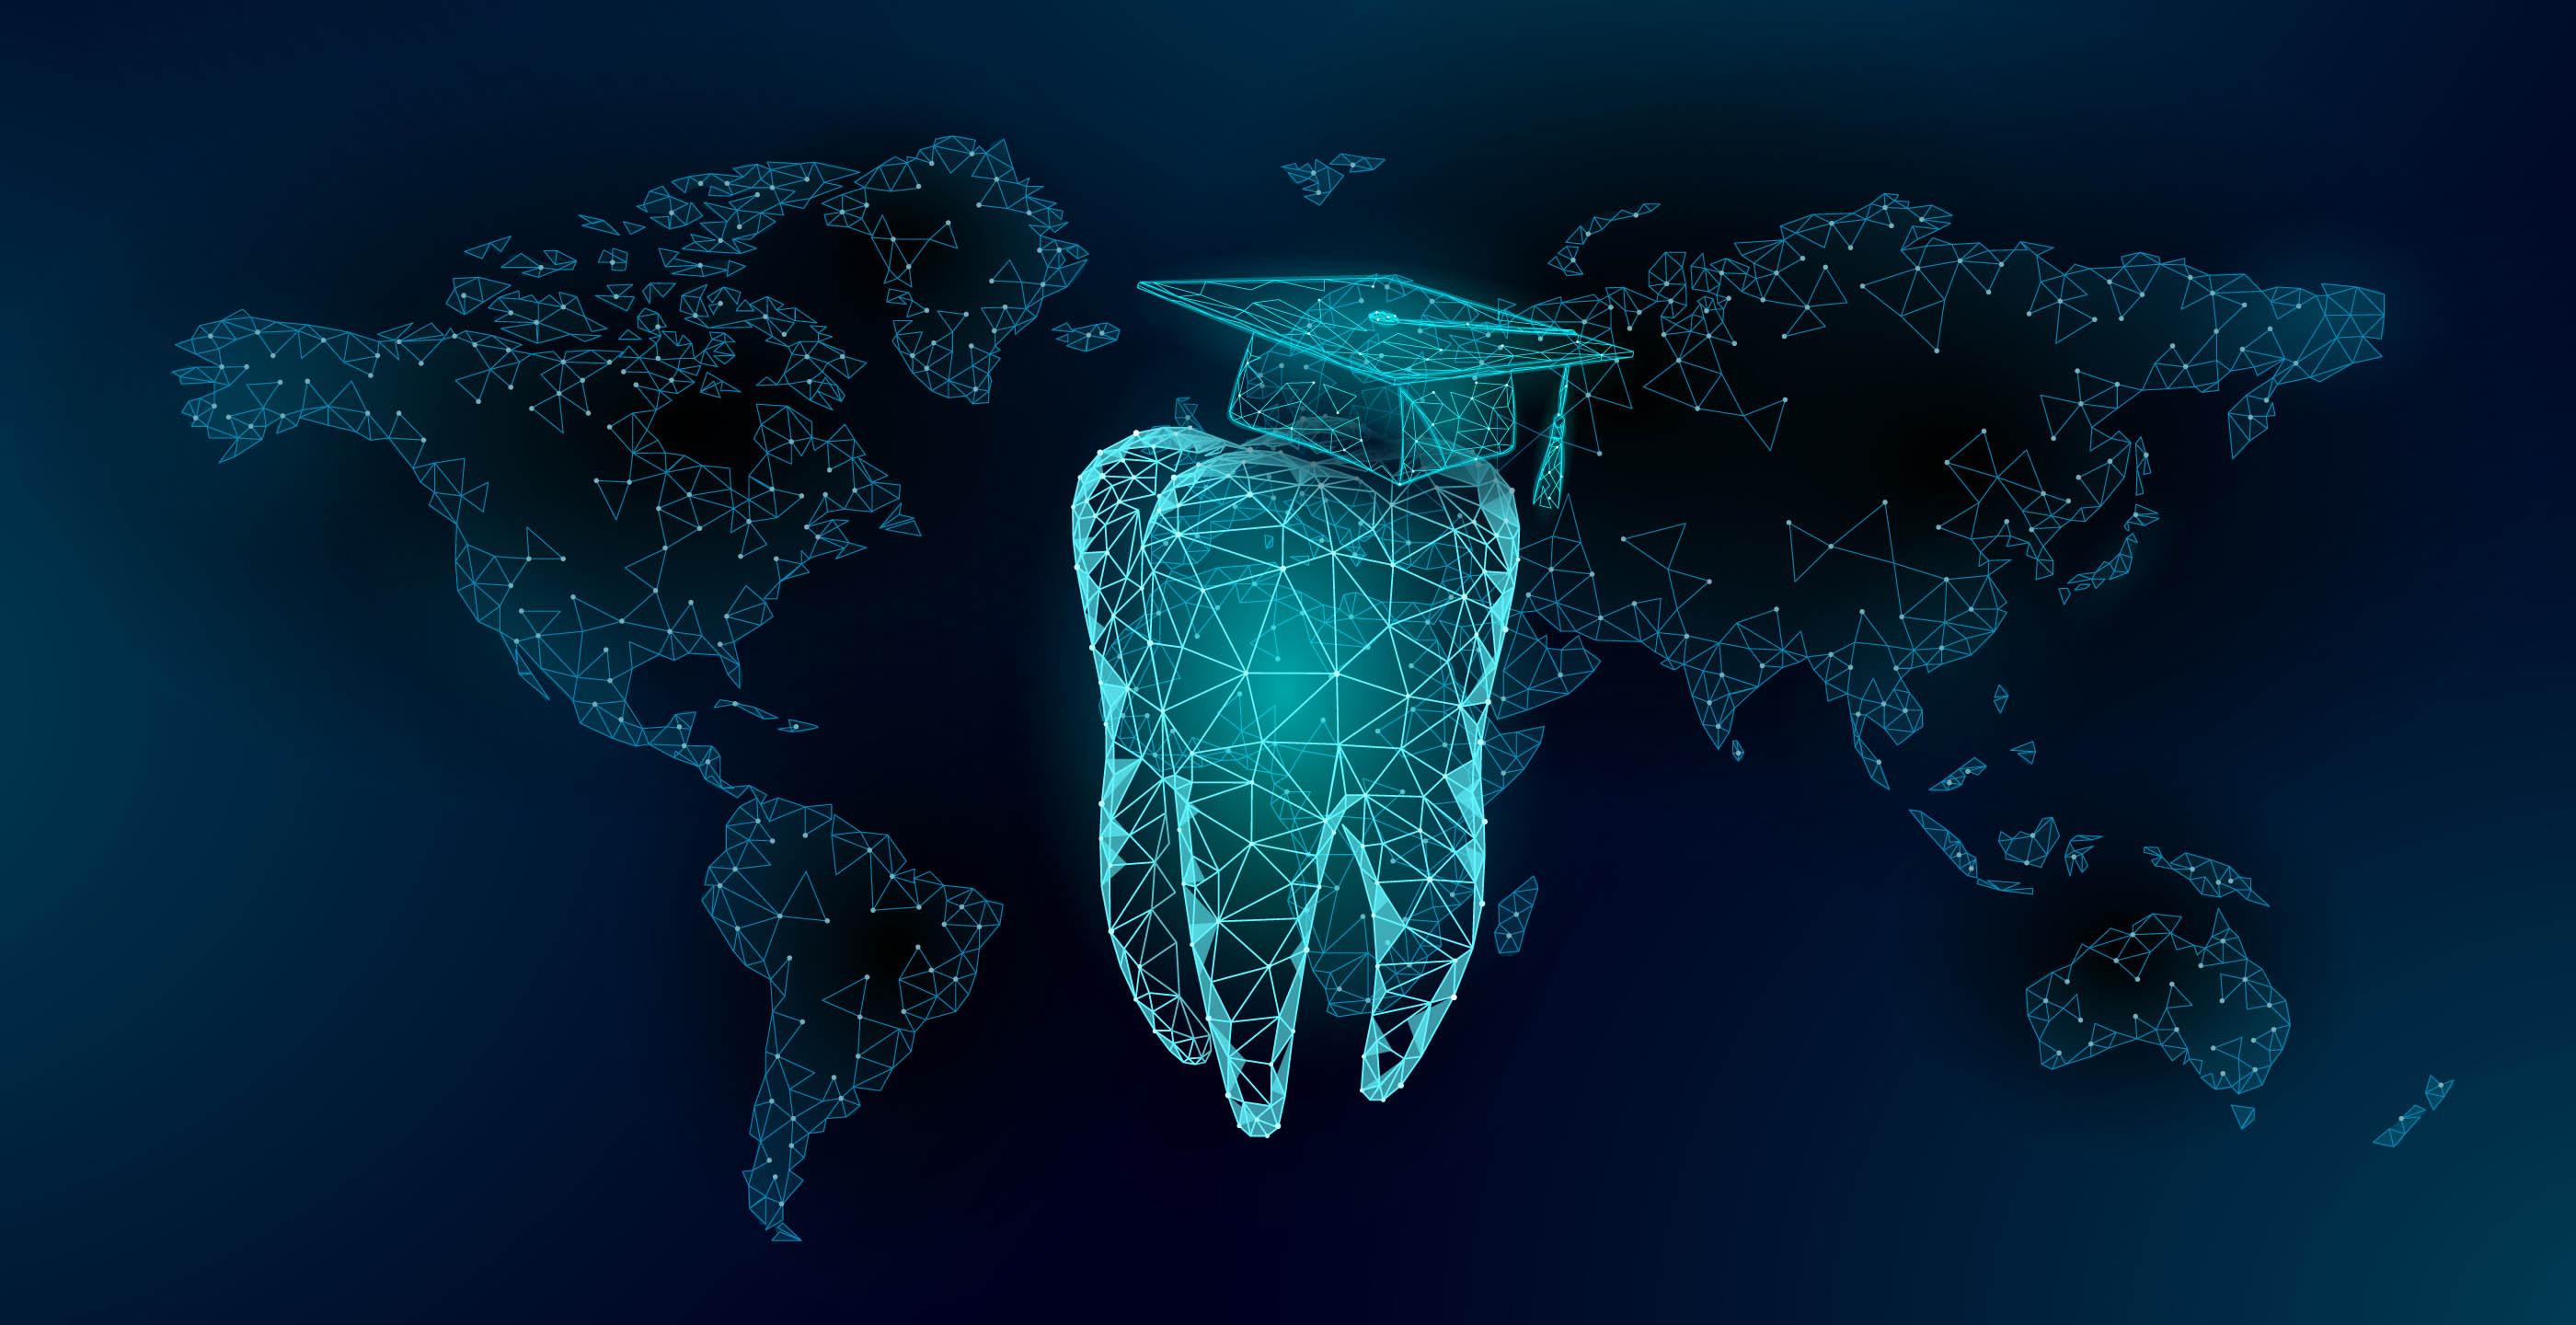 L'Odontoiatria deve essere considerata laurea specialistica